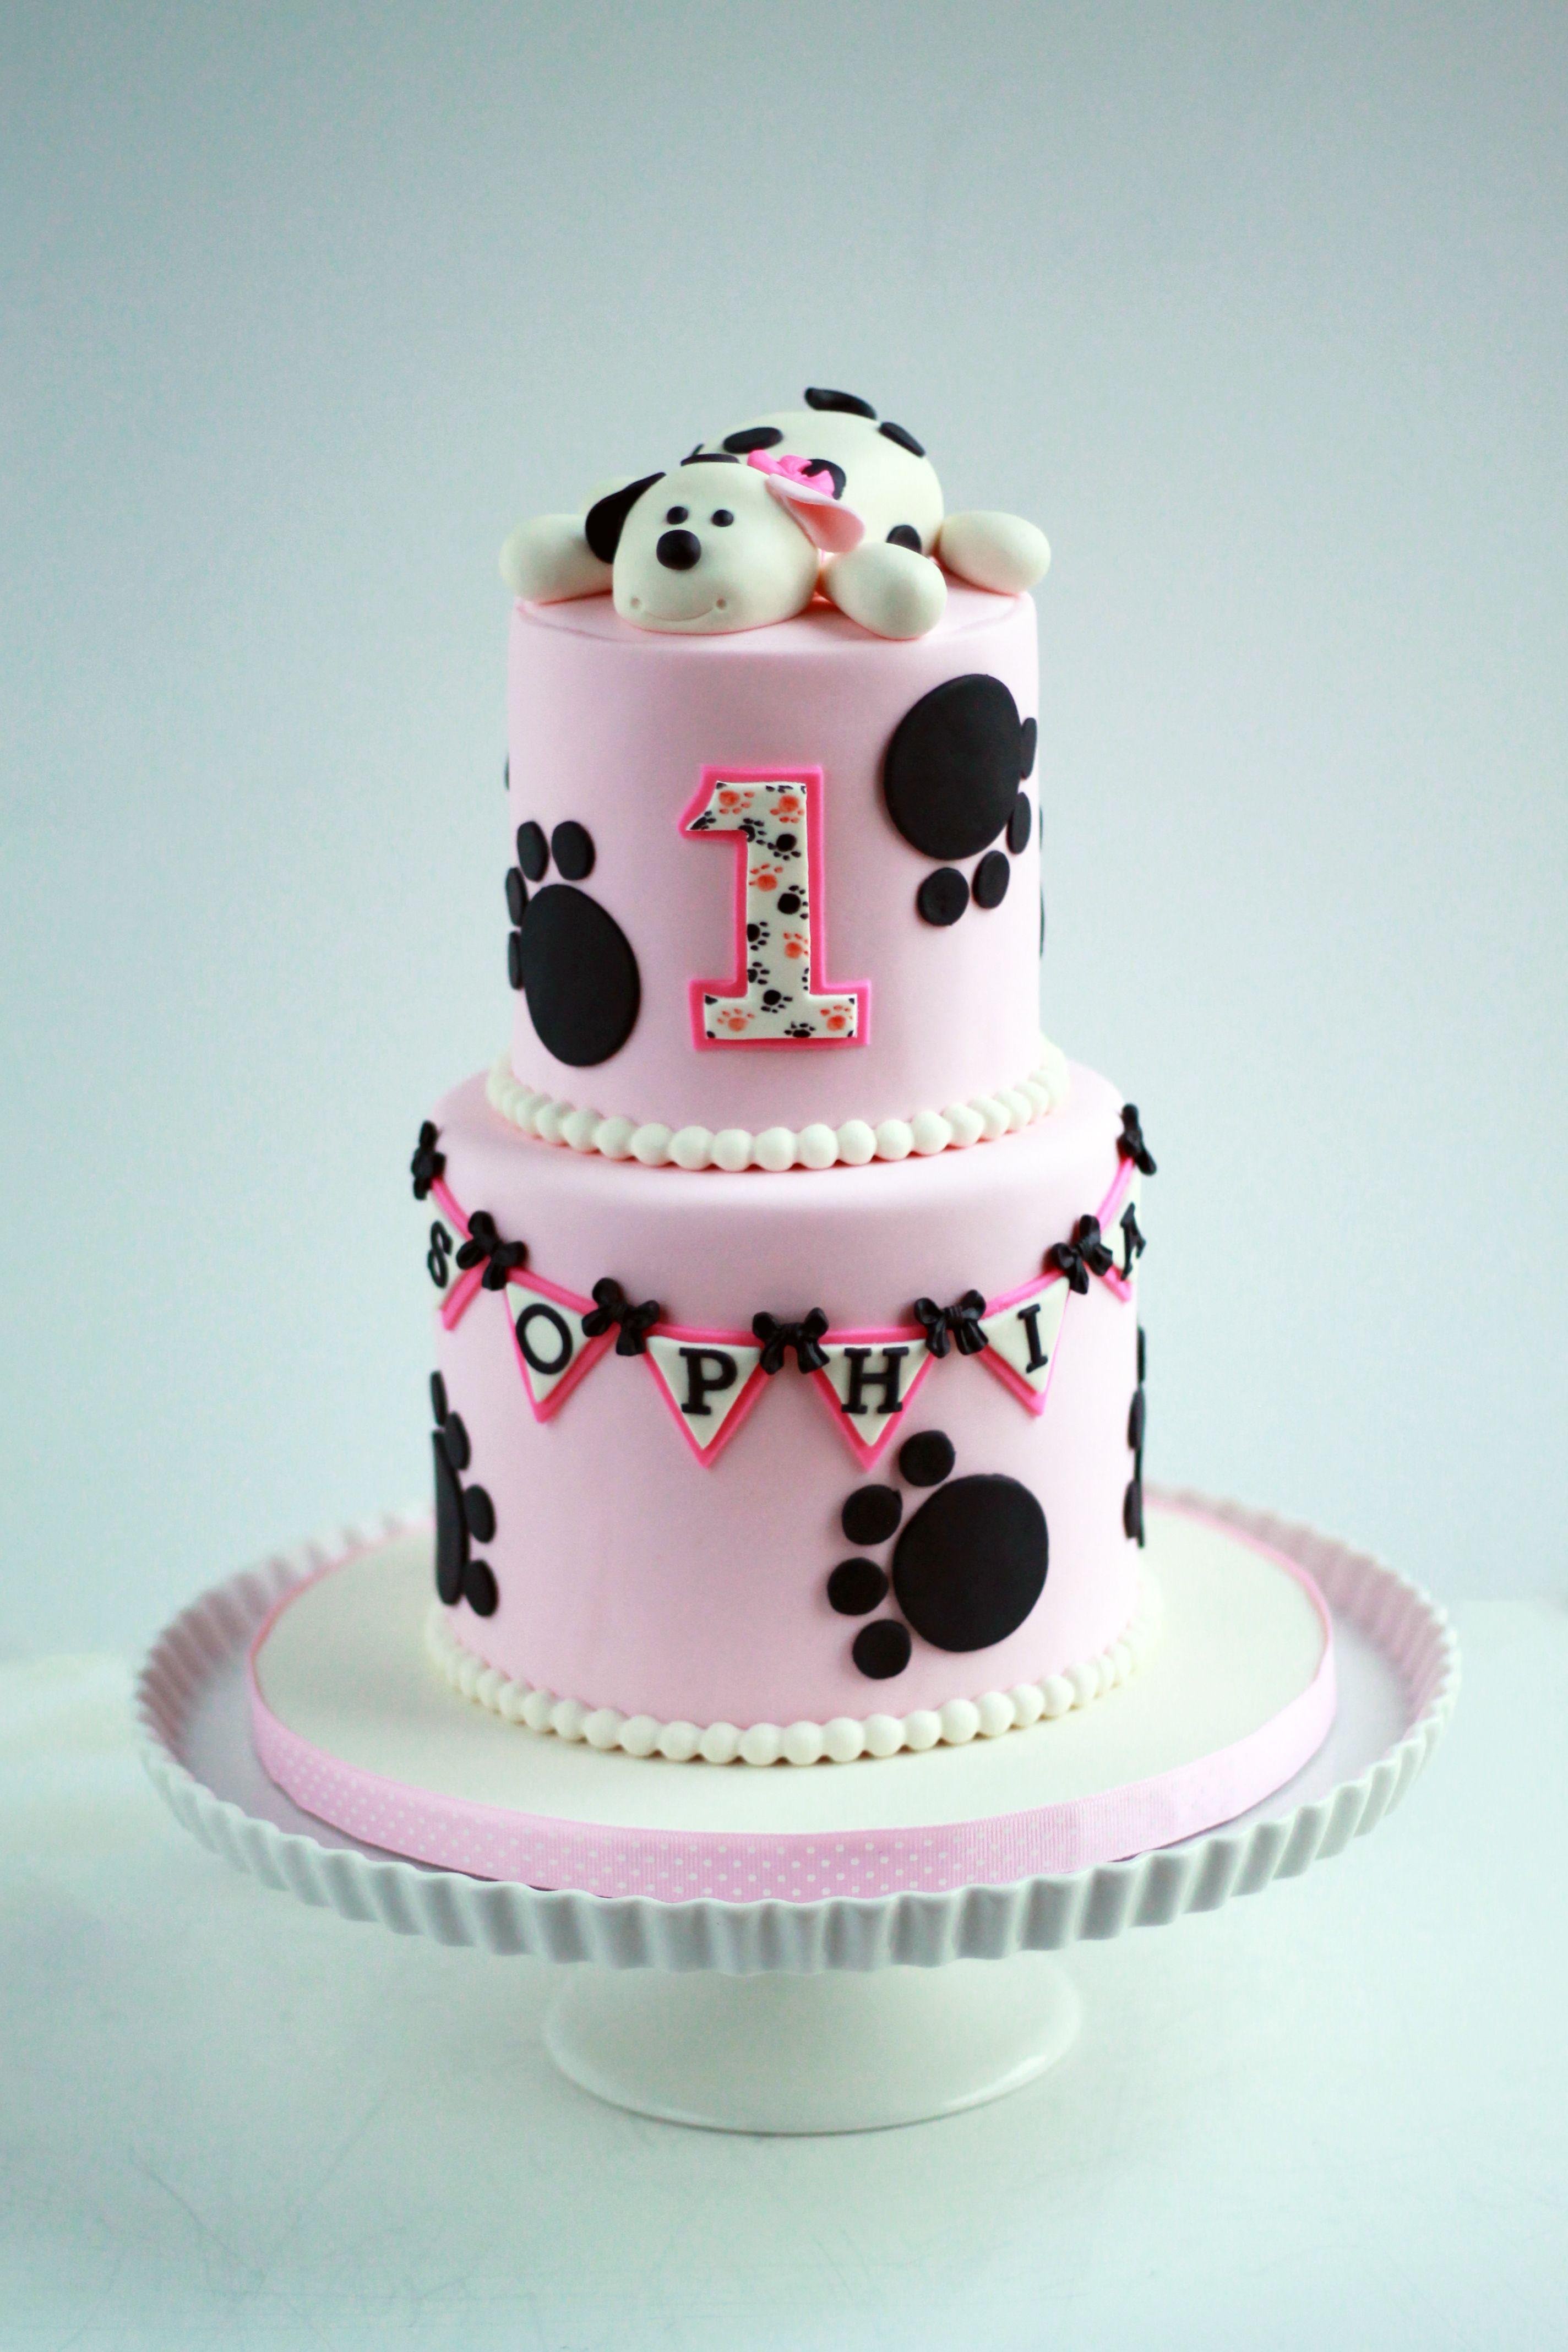 Pink Black And White Dalmatian Puppy First Birthday Cake For Baby Girl Puppycake Dalmatiancake Puppy Birthday Cakes Dog Birthday Cake First Birthday Cakes